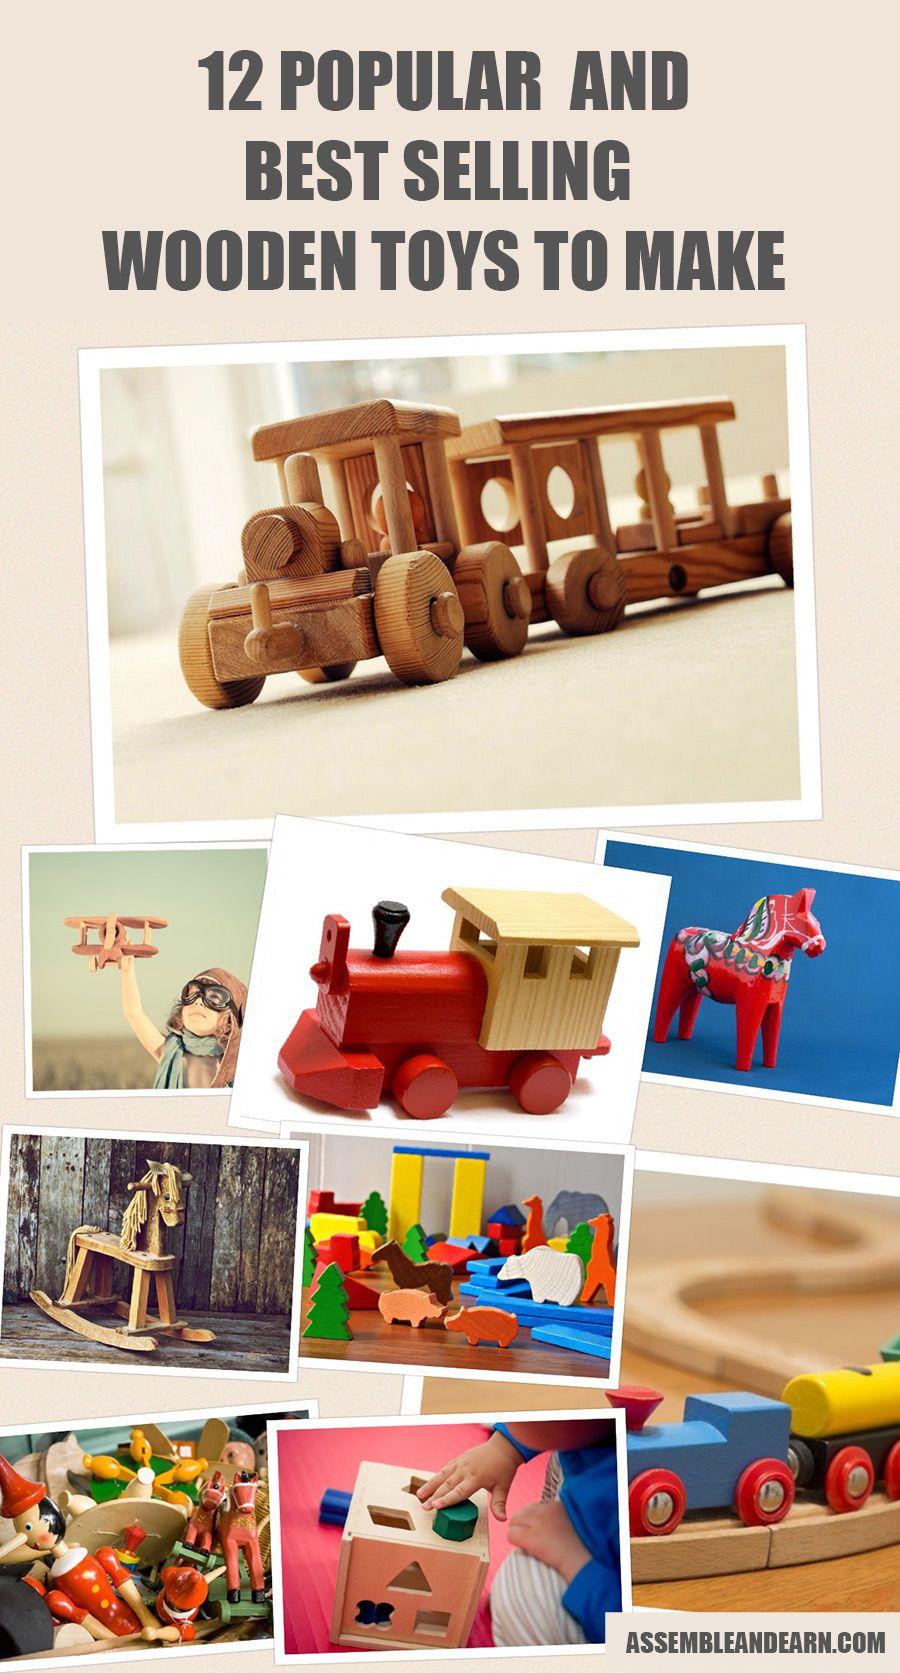 12 best selling wood toys | oyuncak | diy wooden toys plans